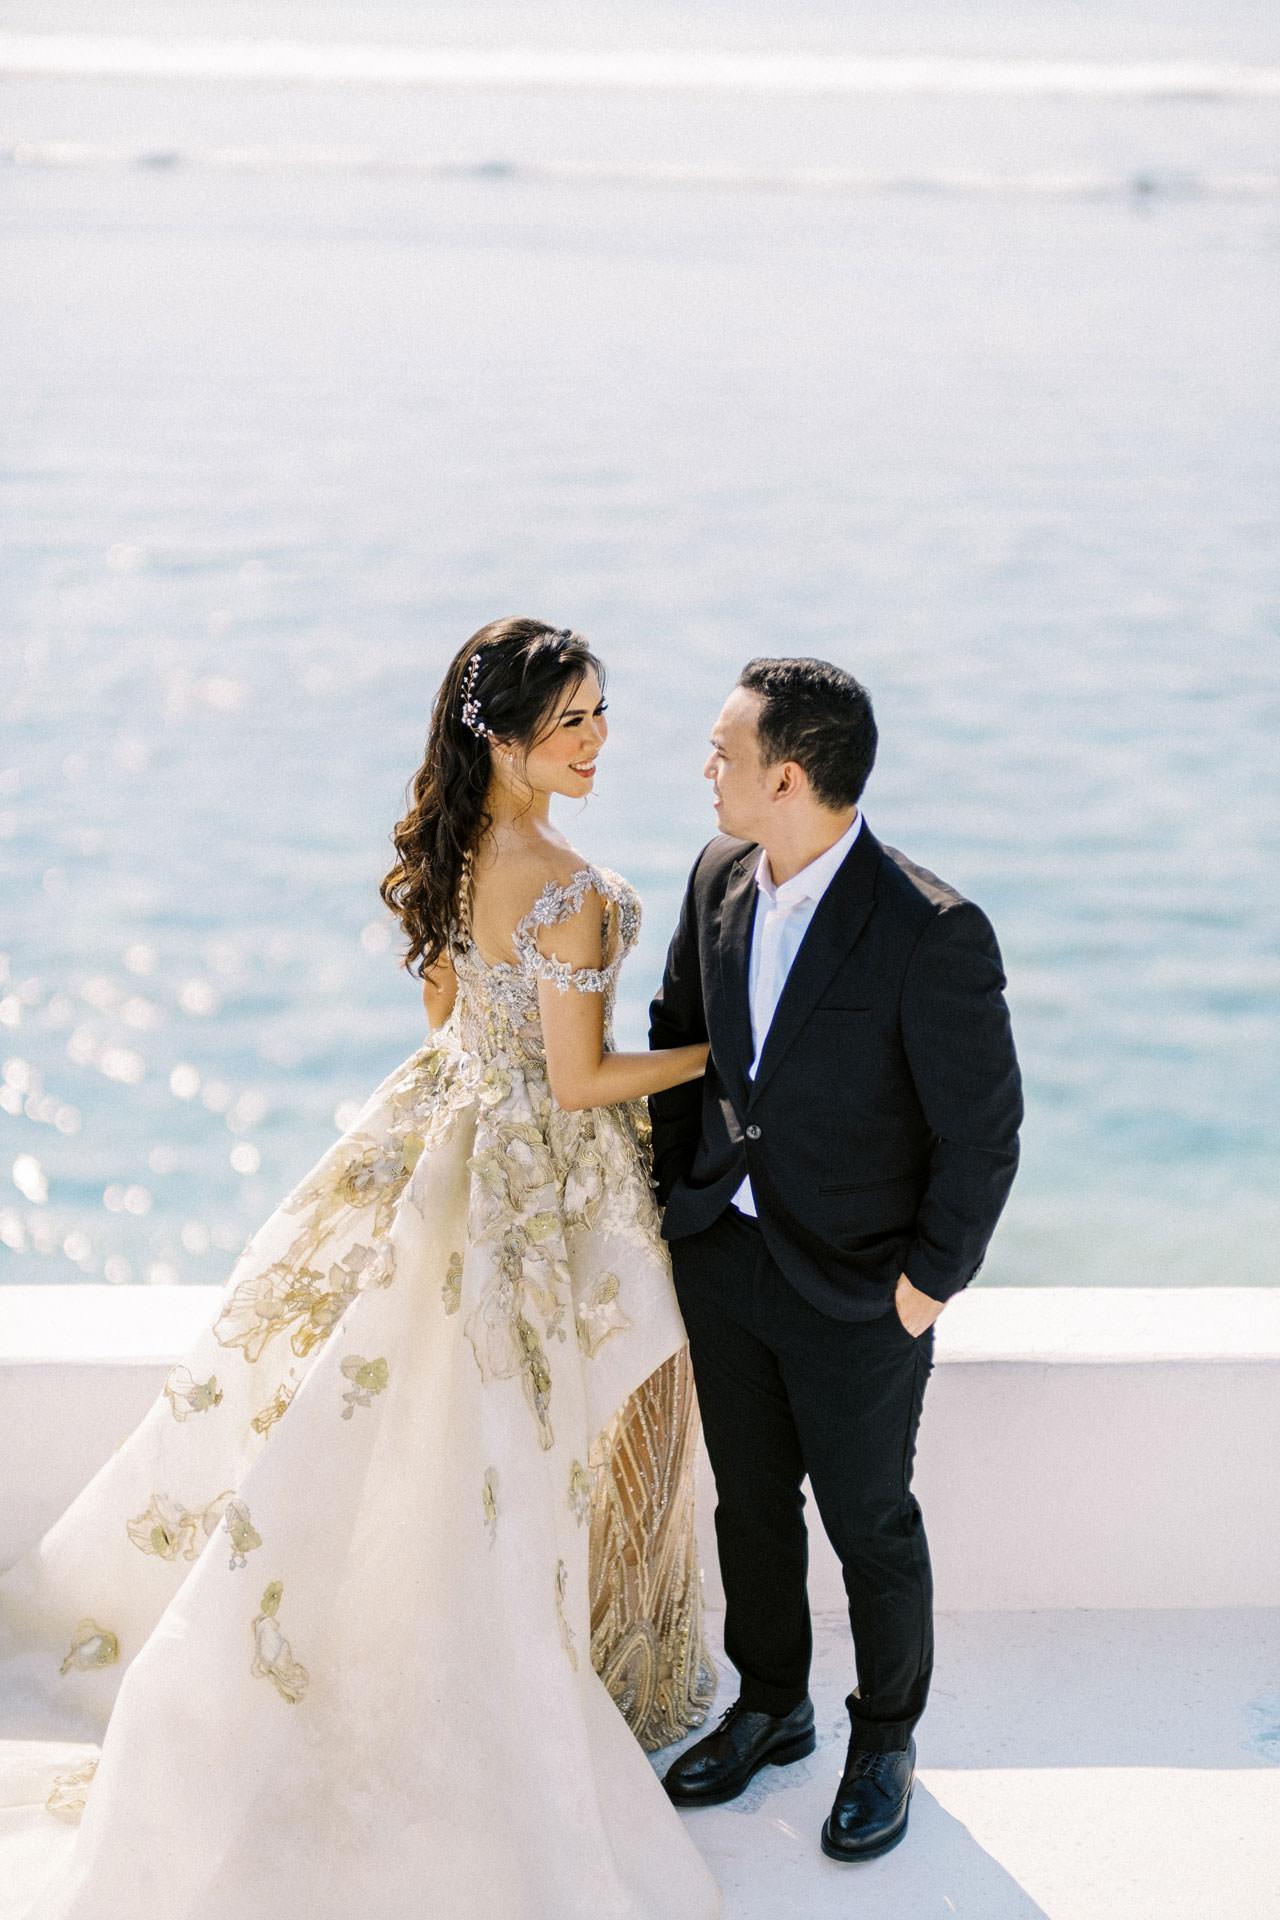 Glam Santorini Prewedding at Morabito Art Cliff 3